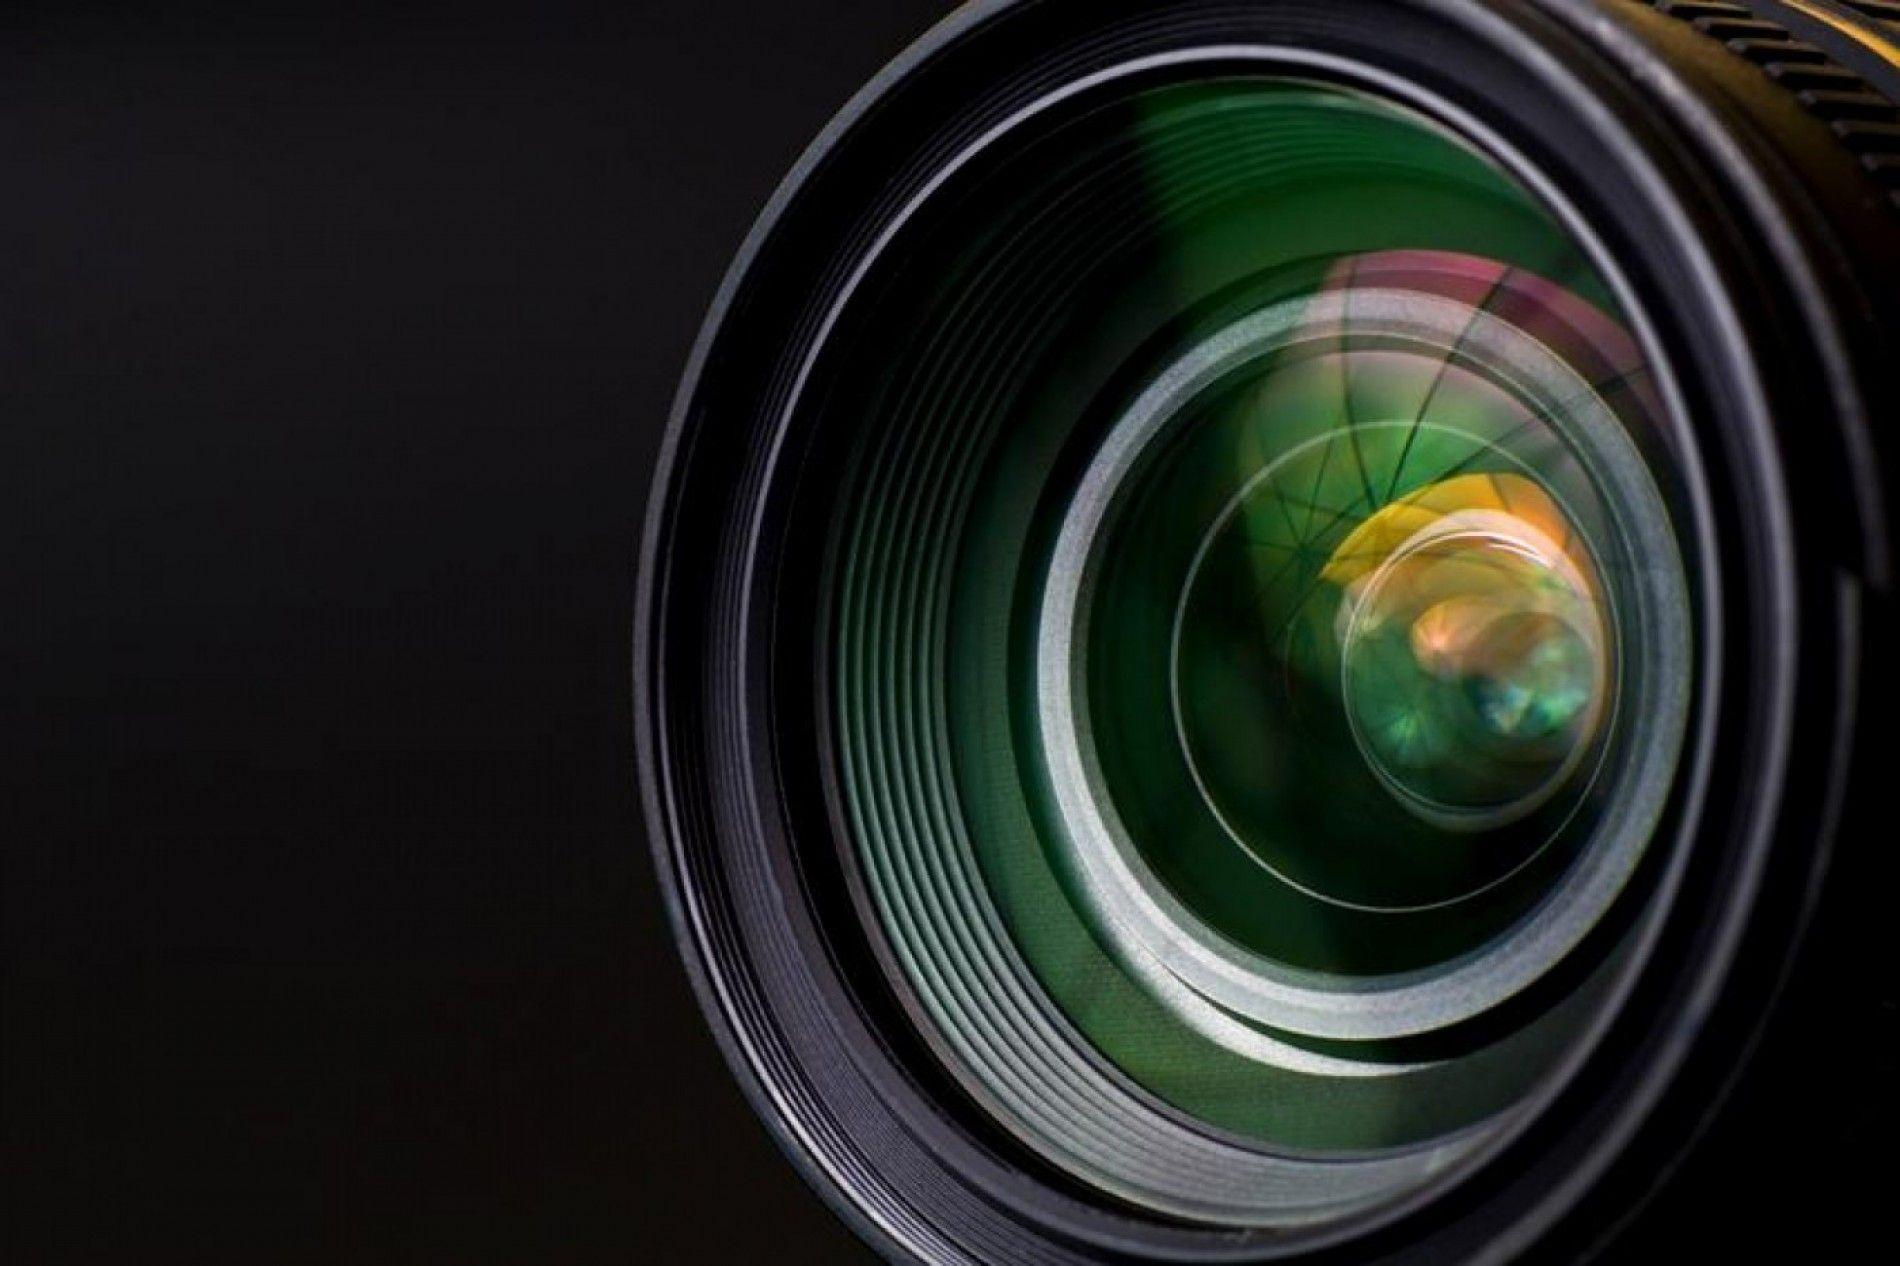 18 Excellent HD Camera Lens Wallpapers - HDWallSource.com